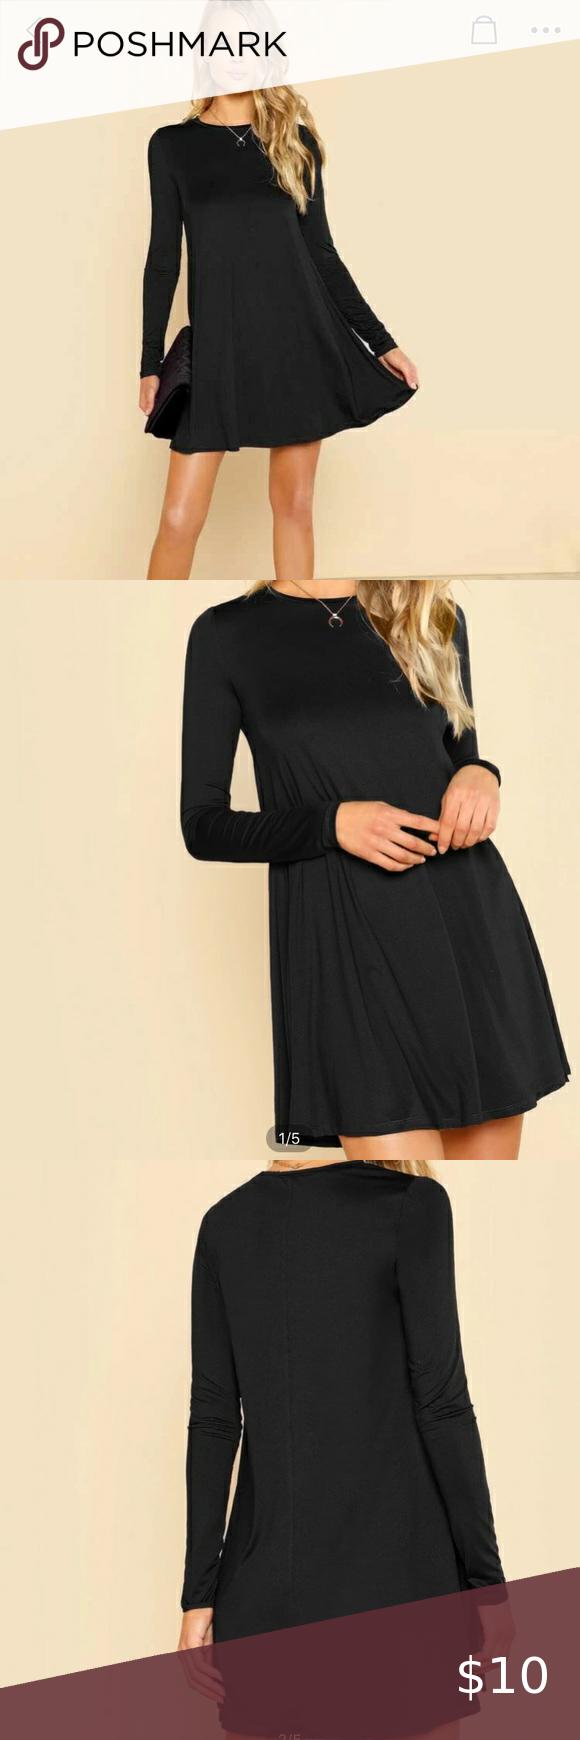 Nwt Black Swing Dress Shein Basic Long Sleeve Flow Black Swing Dress Basic Long Sleeve Dresses [ 1740 x 580 Pixel ]